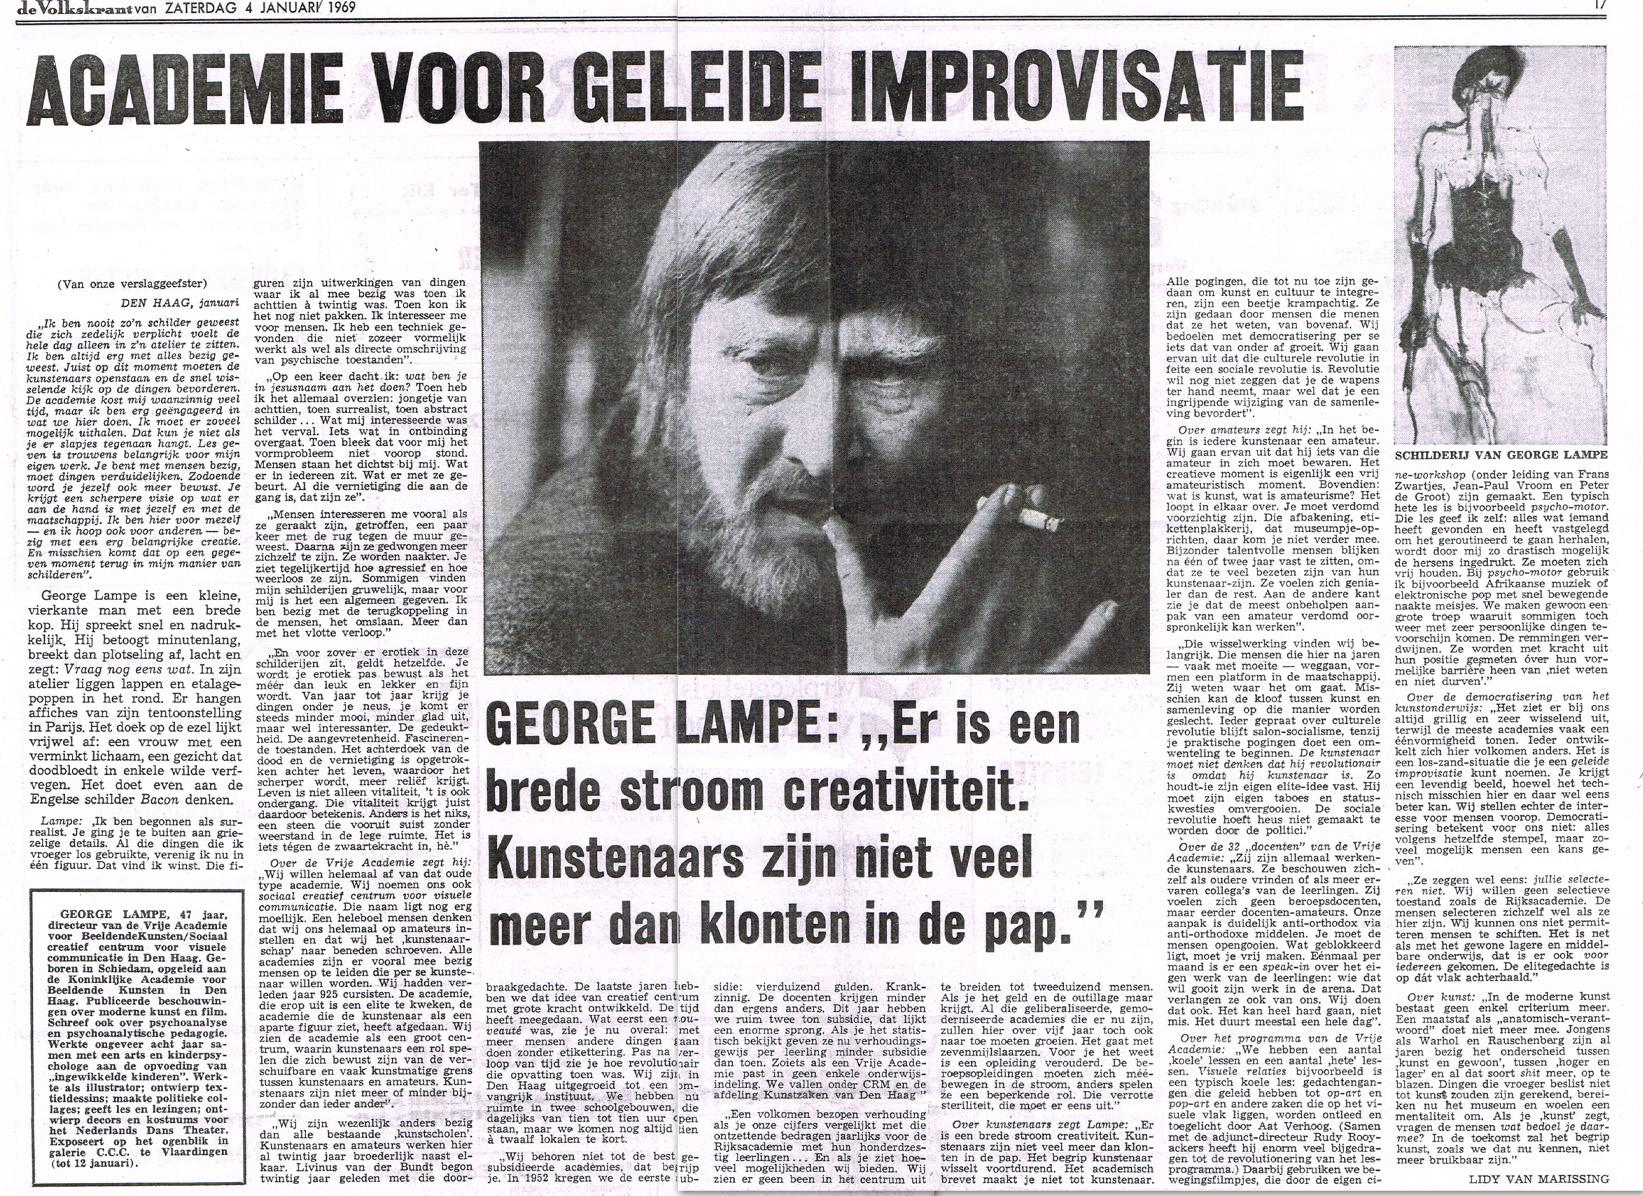 Volkskrant, 4 Januari 1969